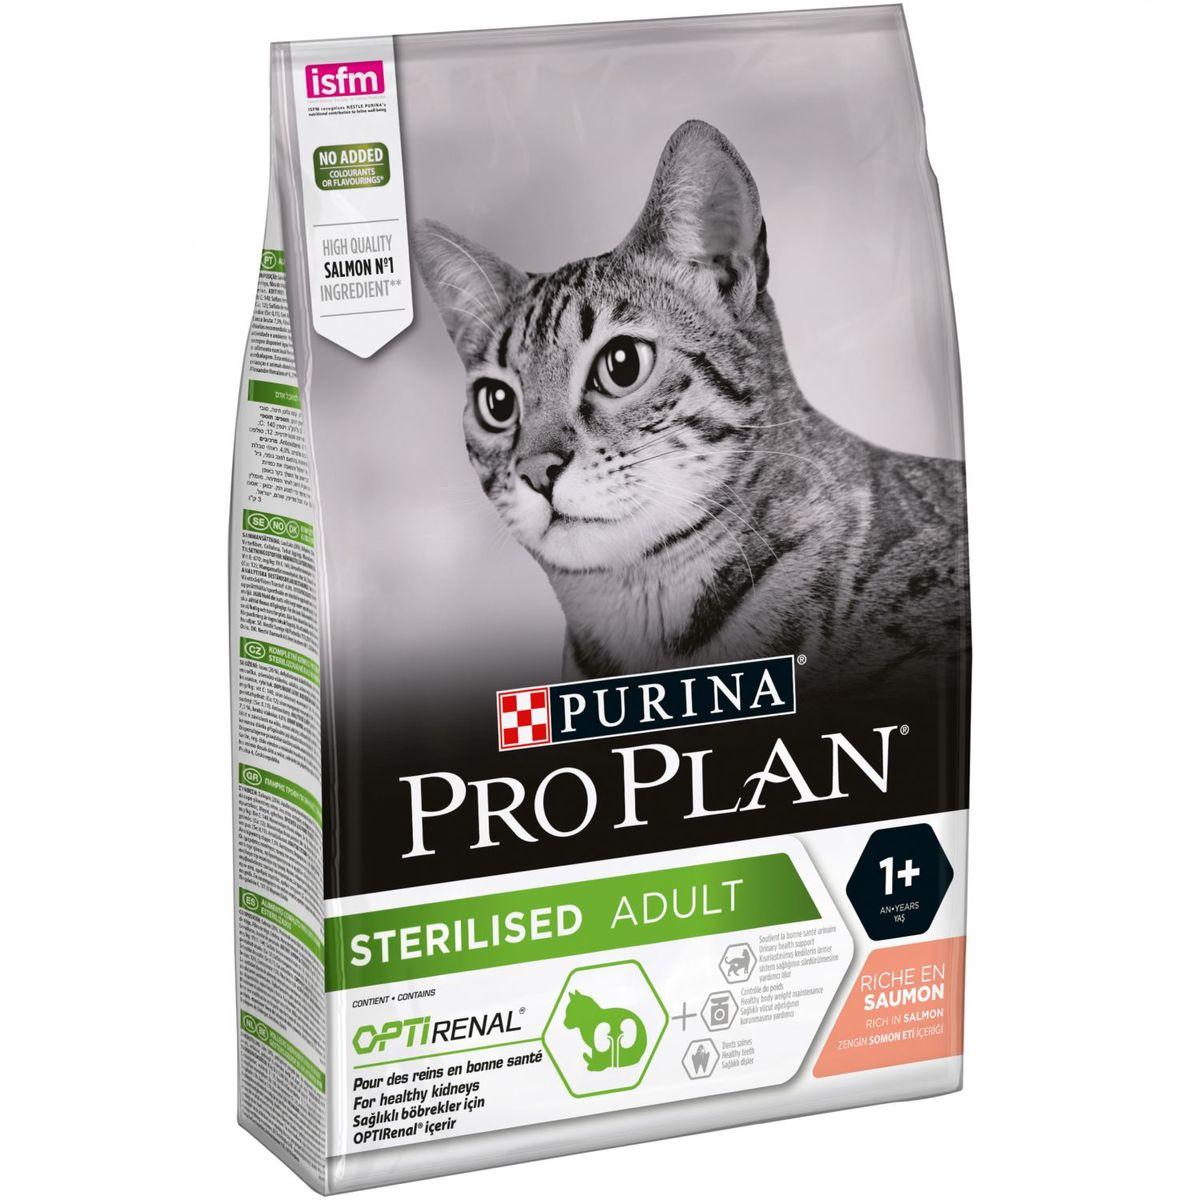 Purina Pro Plan gato sterilised salmón